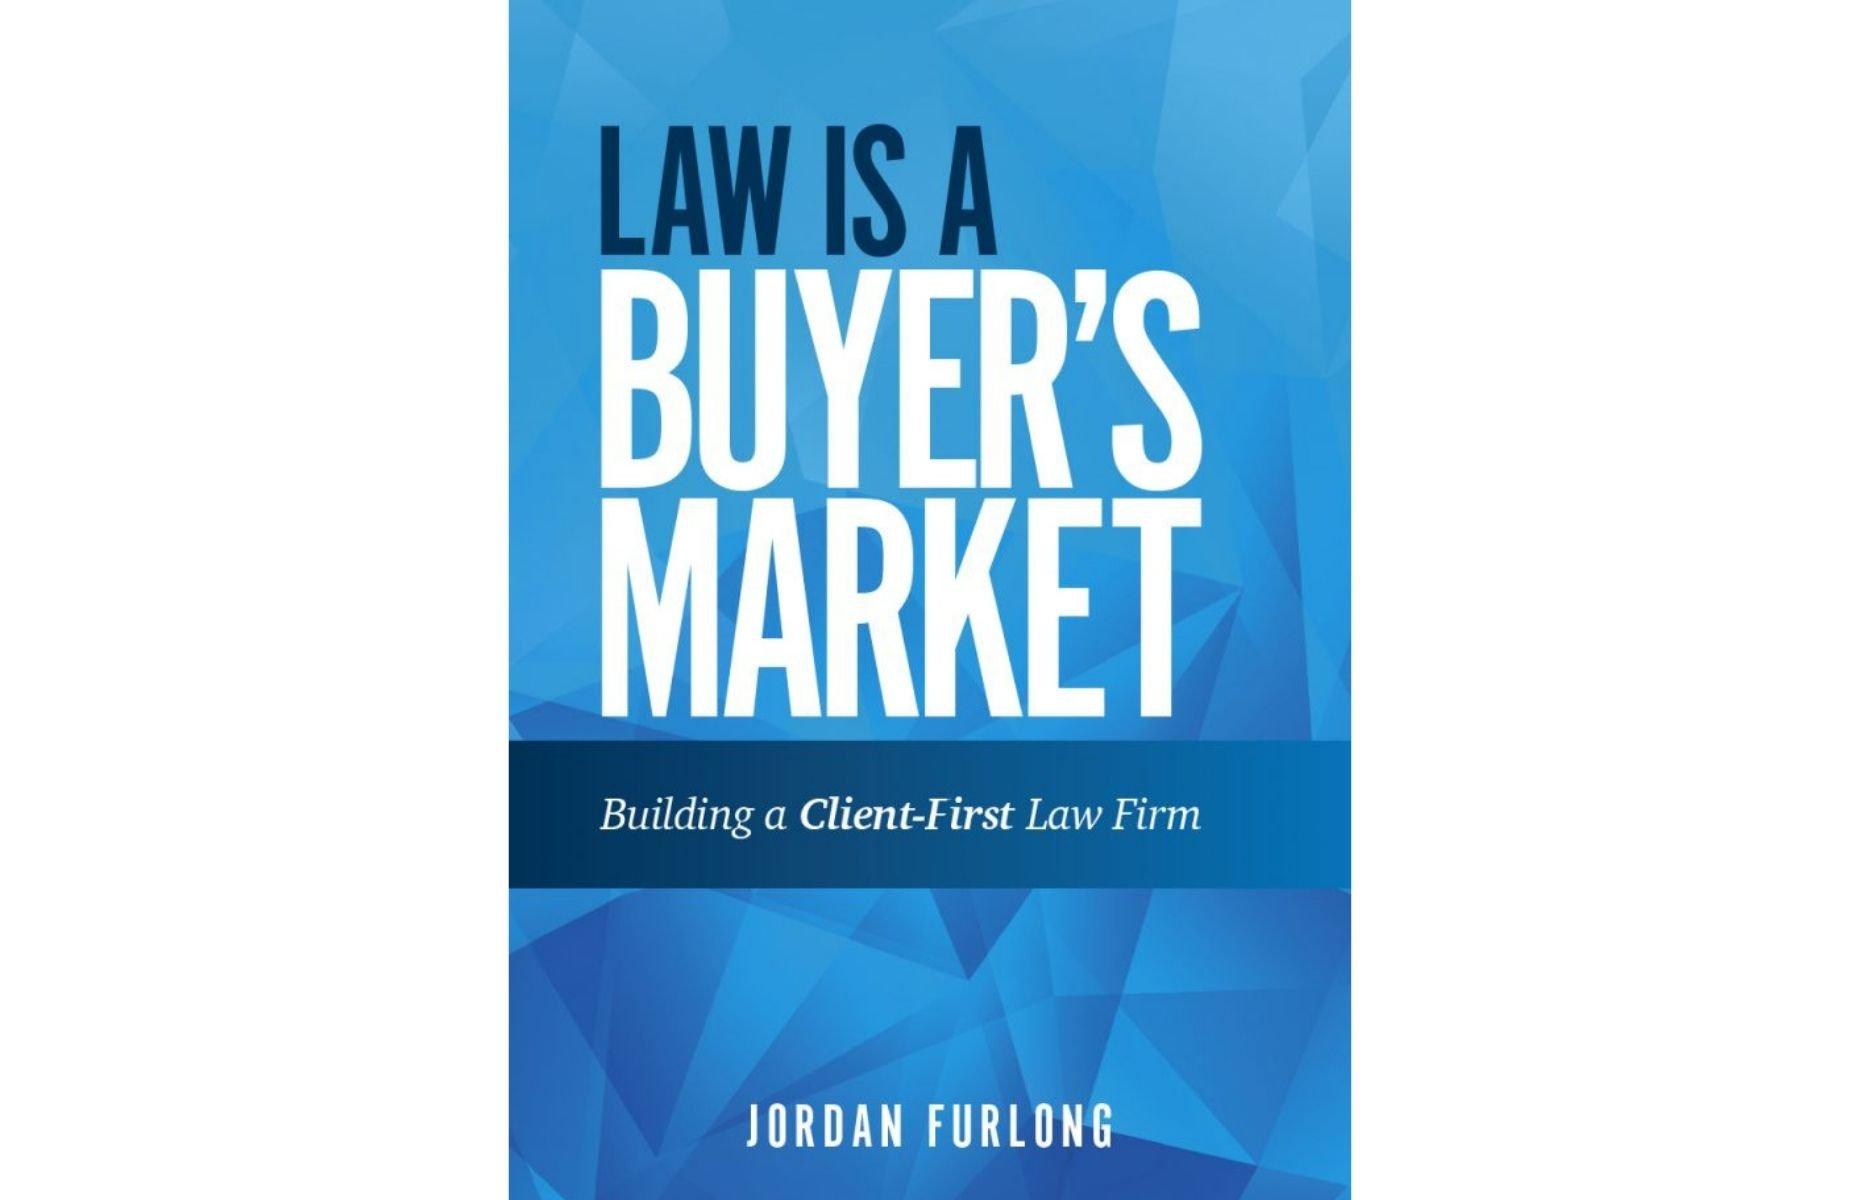 #7 Law-is-a-buyers-market